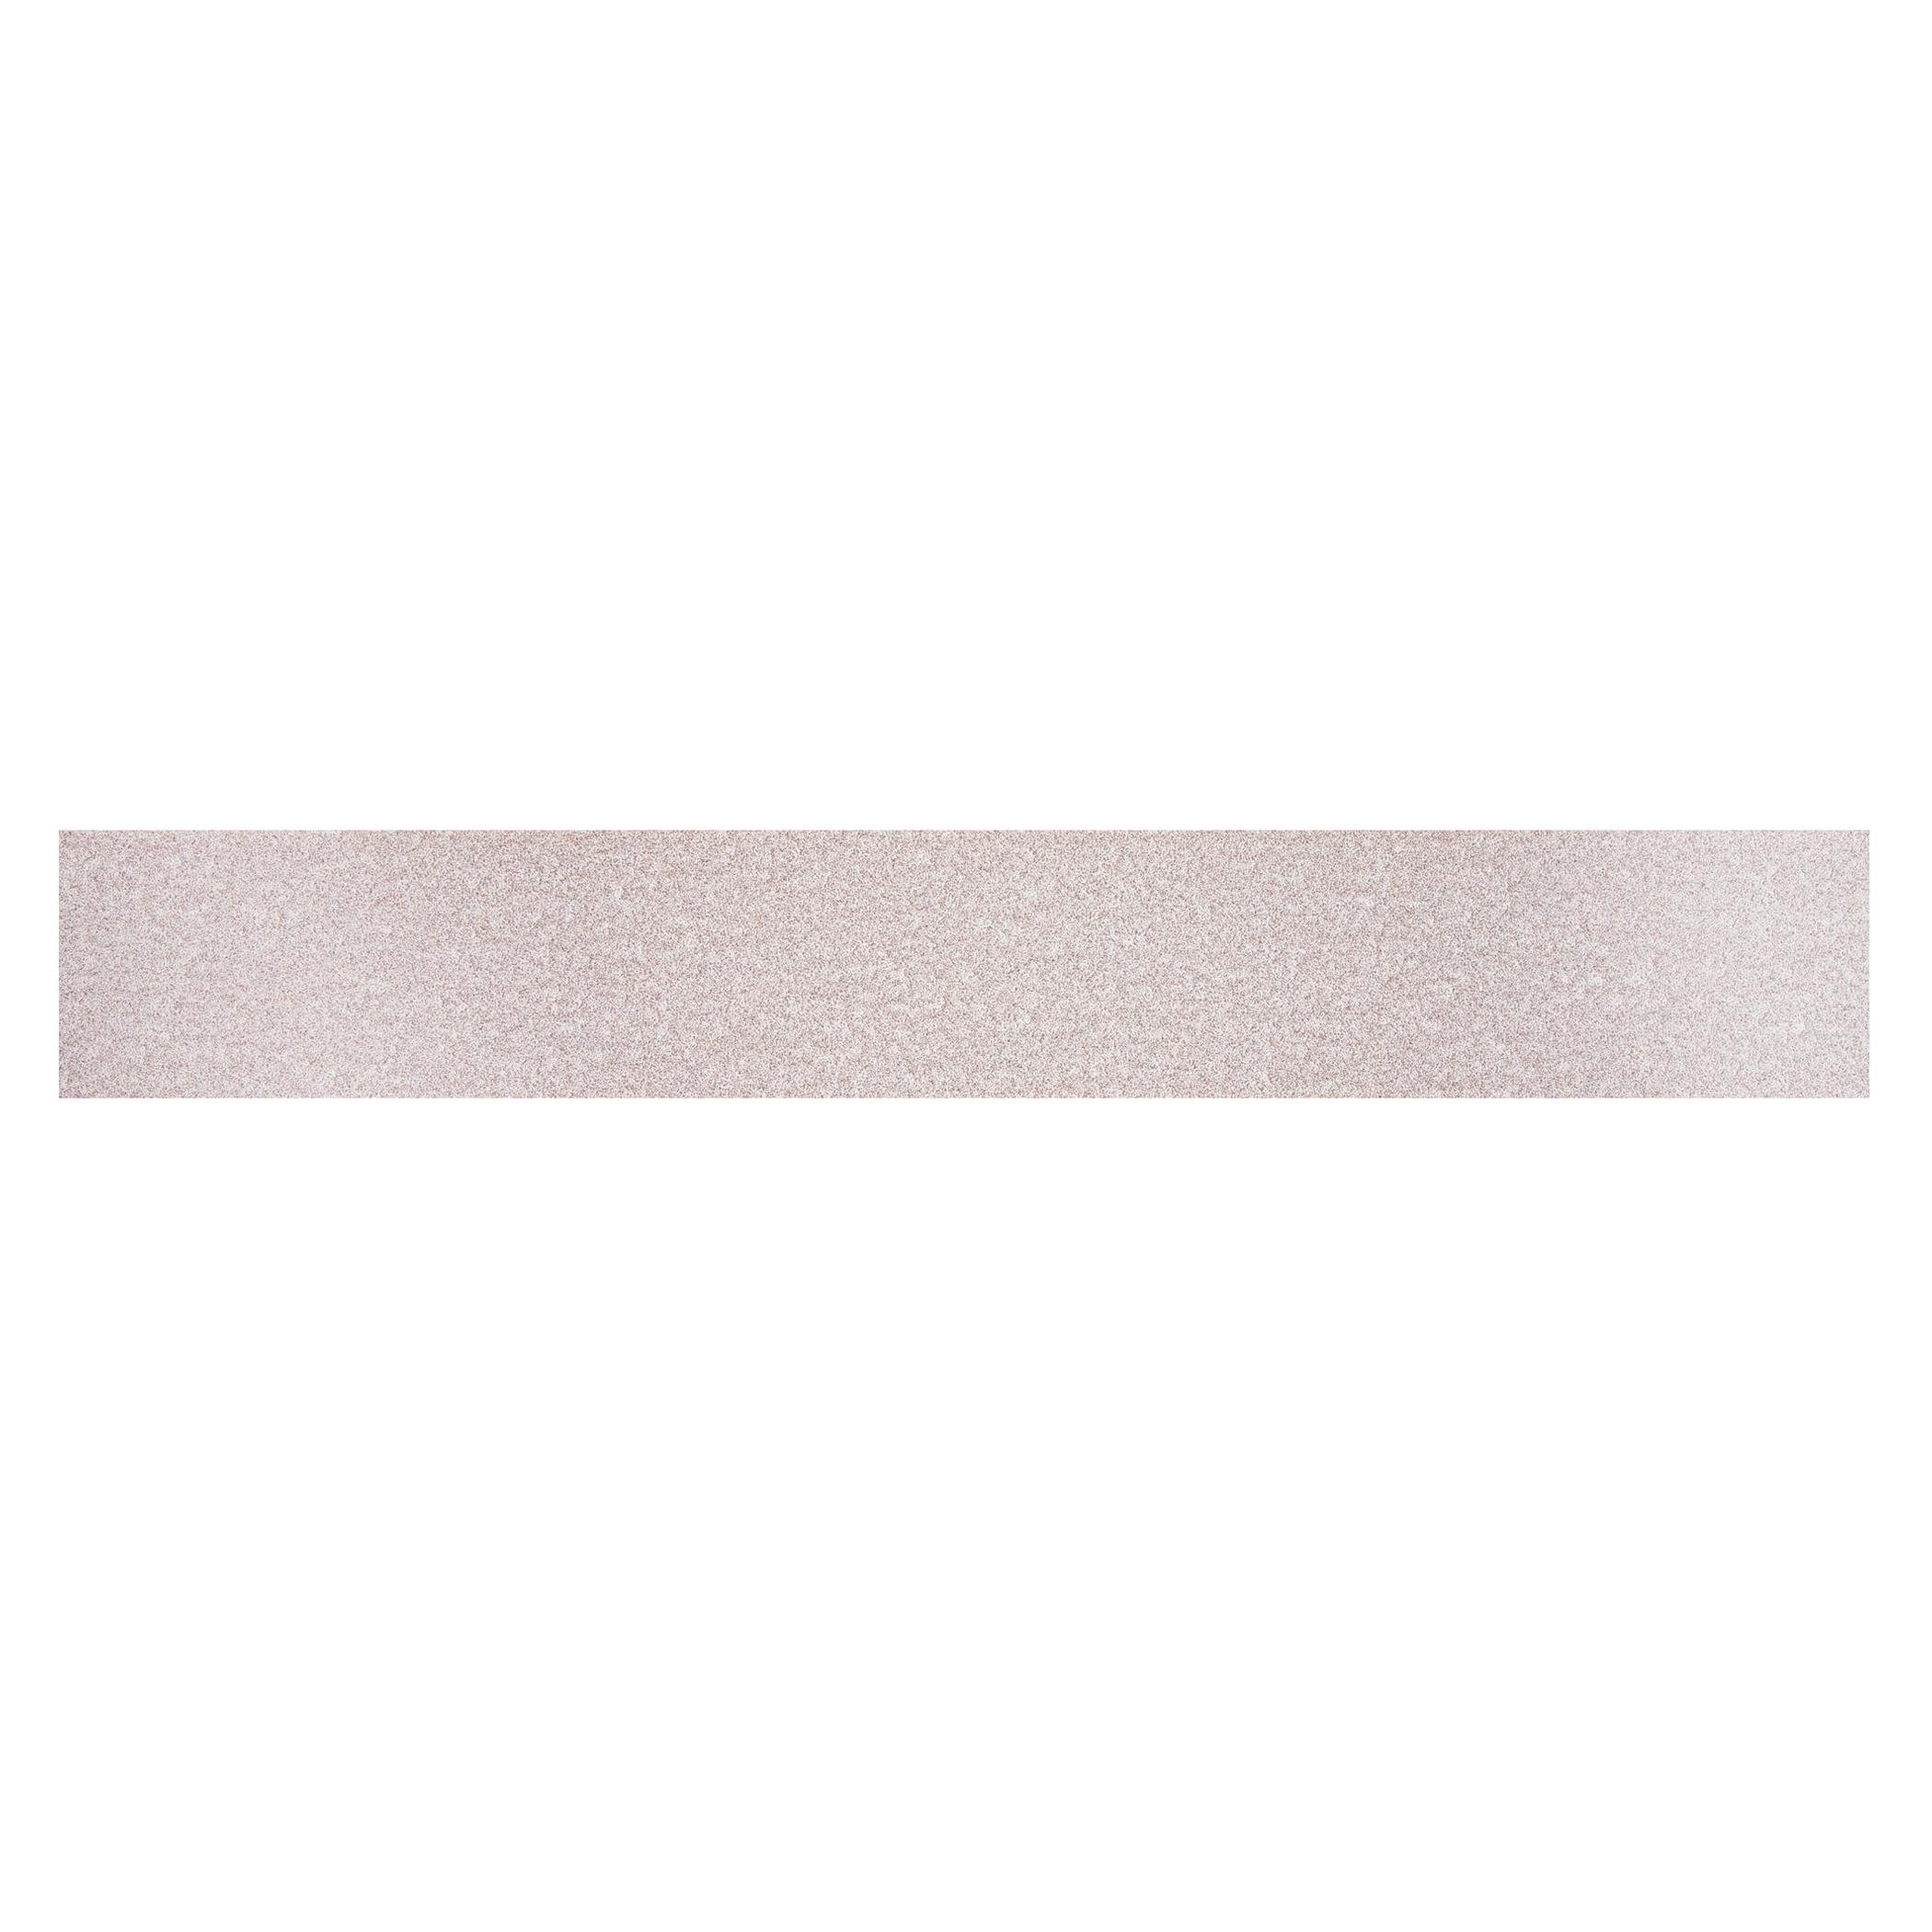 Norton® 66261131651 A275OP Non-PSA Coated File Strip, 17-1/2 in L x 2-3/4 in W, P100 Grit, Medium Grade, Aluminum Oxide Abrasive, Anti-Loading Paper Backing